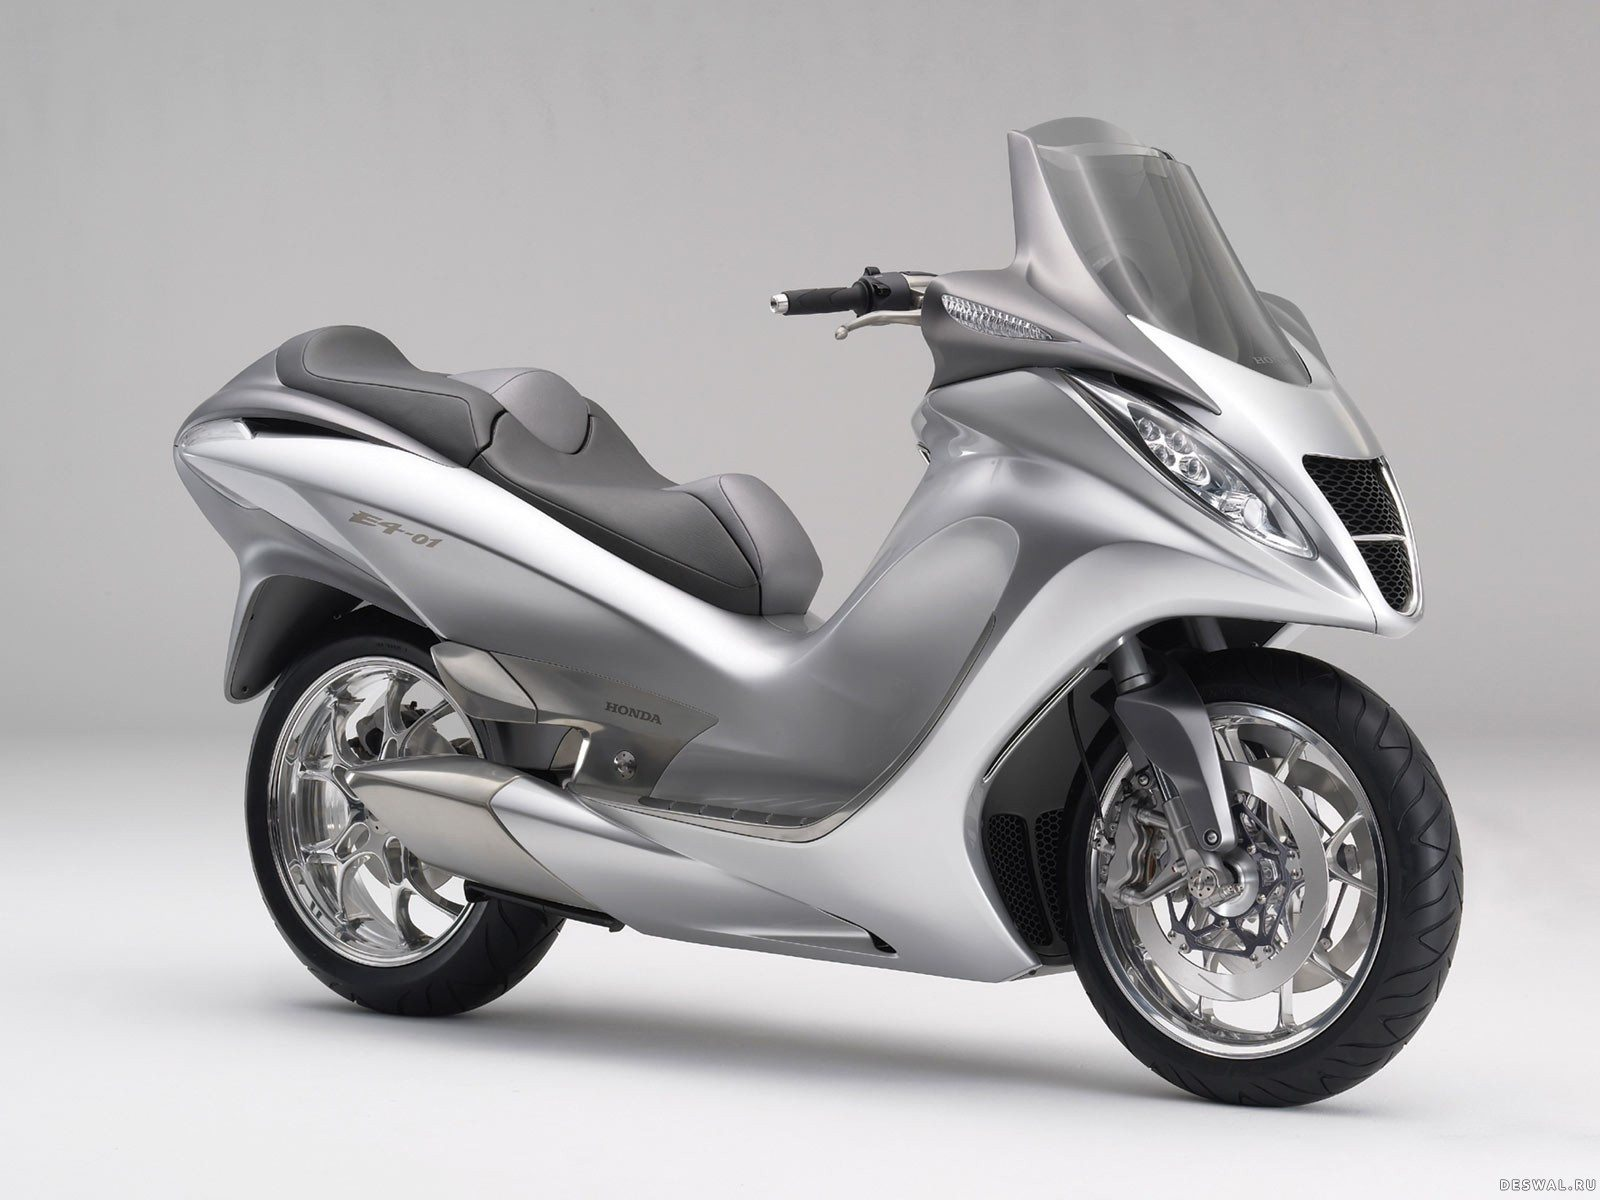 Фото мотоцикла homa f5 15 фотография